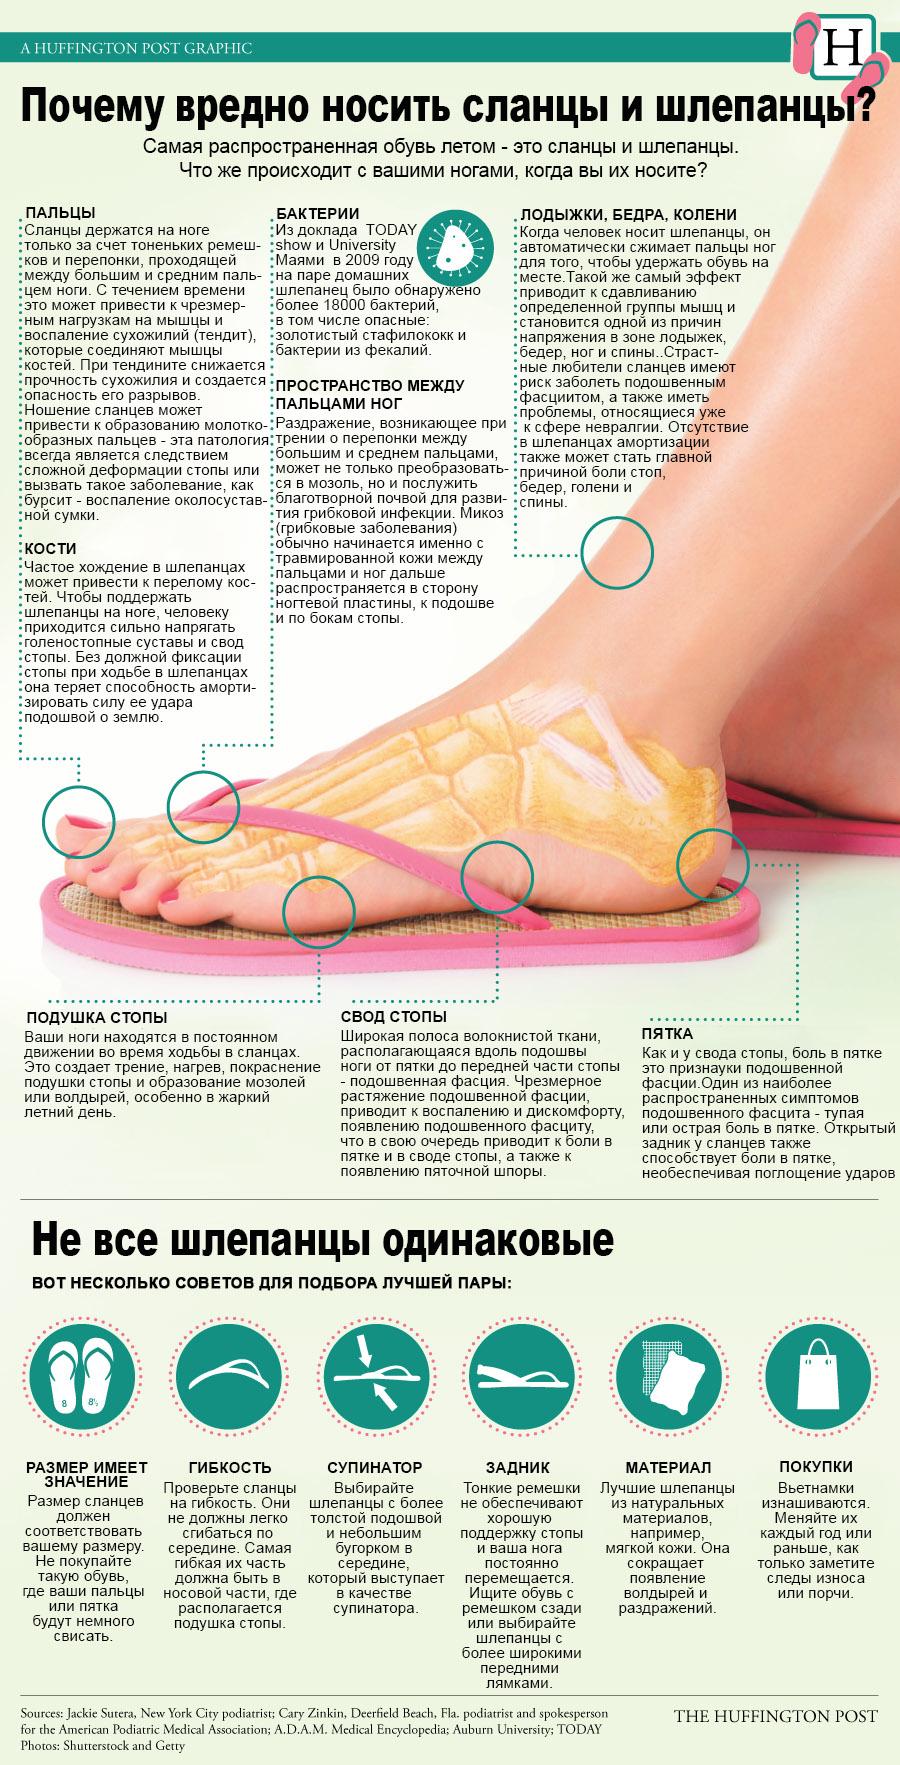 http://lifehacker.ru/wp-content/uploads/2013/07/slan.jpg